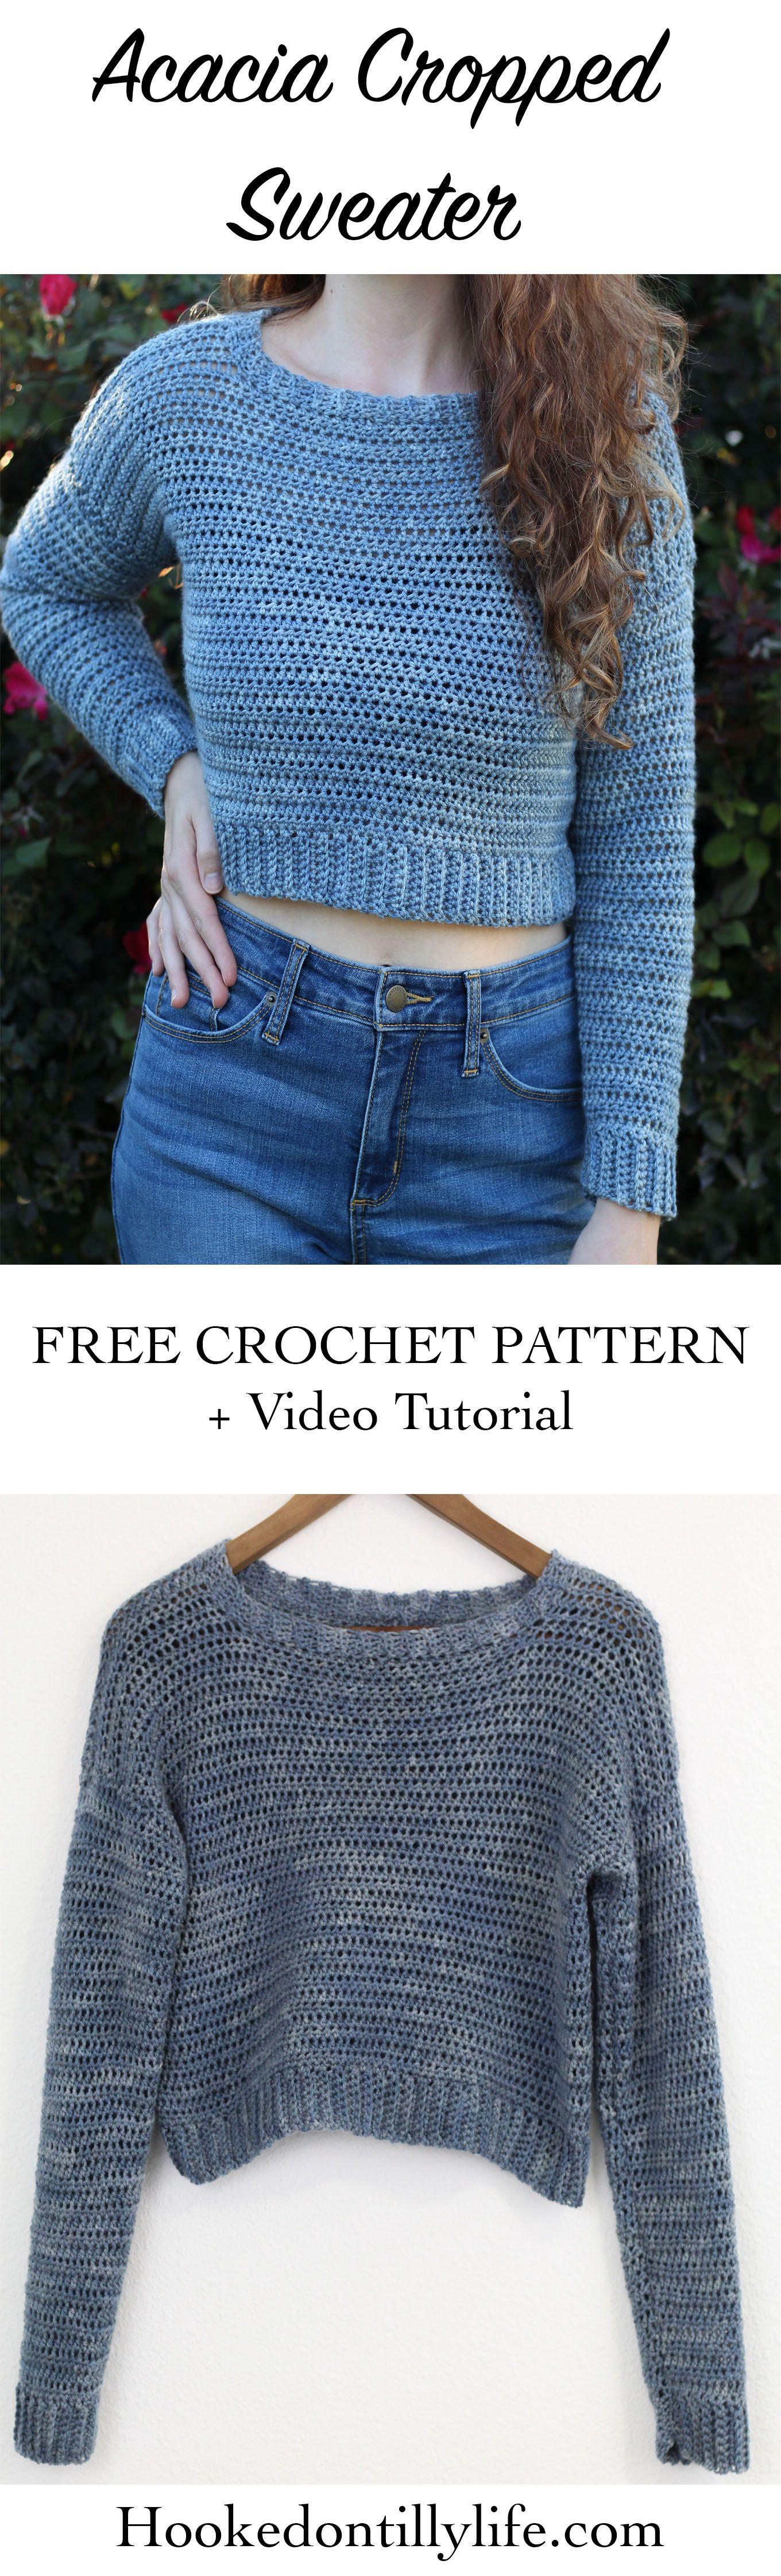 dbadcba00fdf1e free crochet pattern